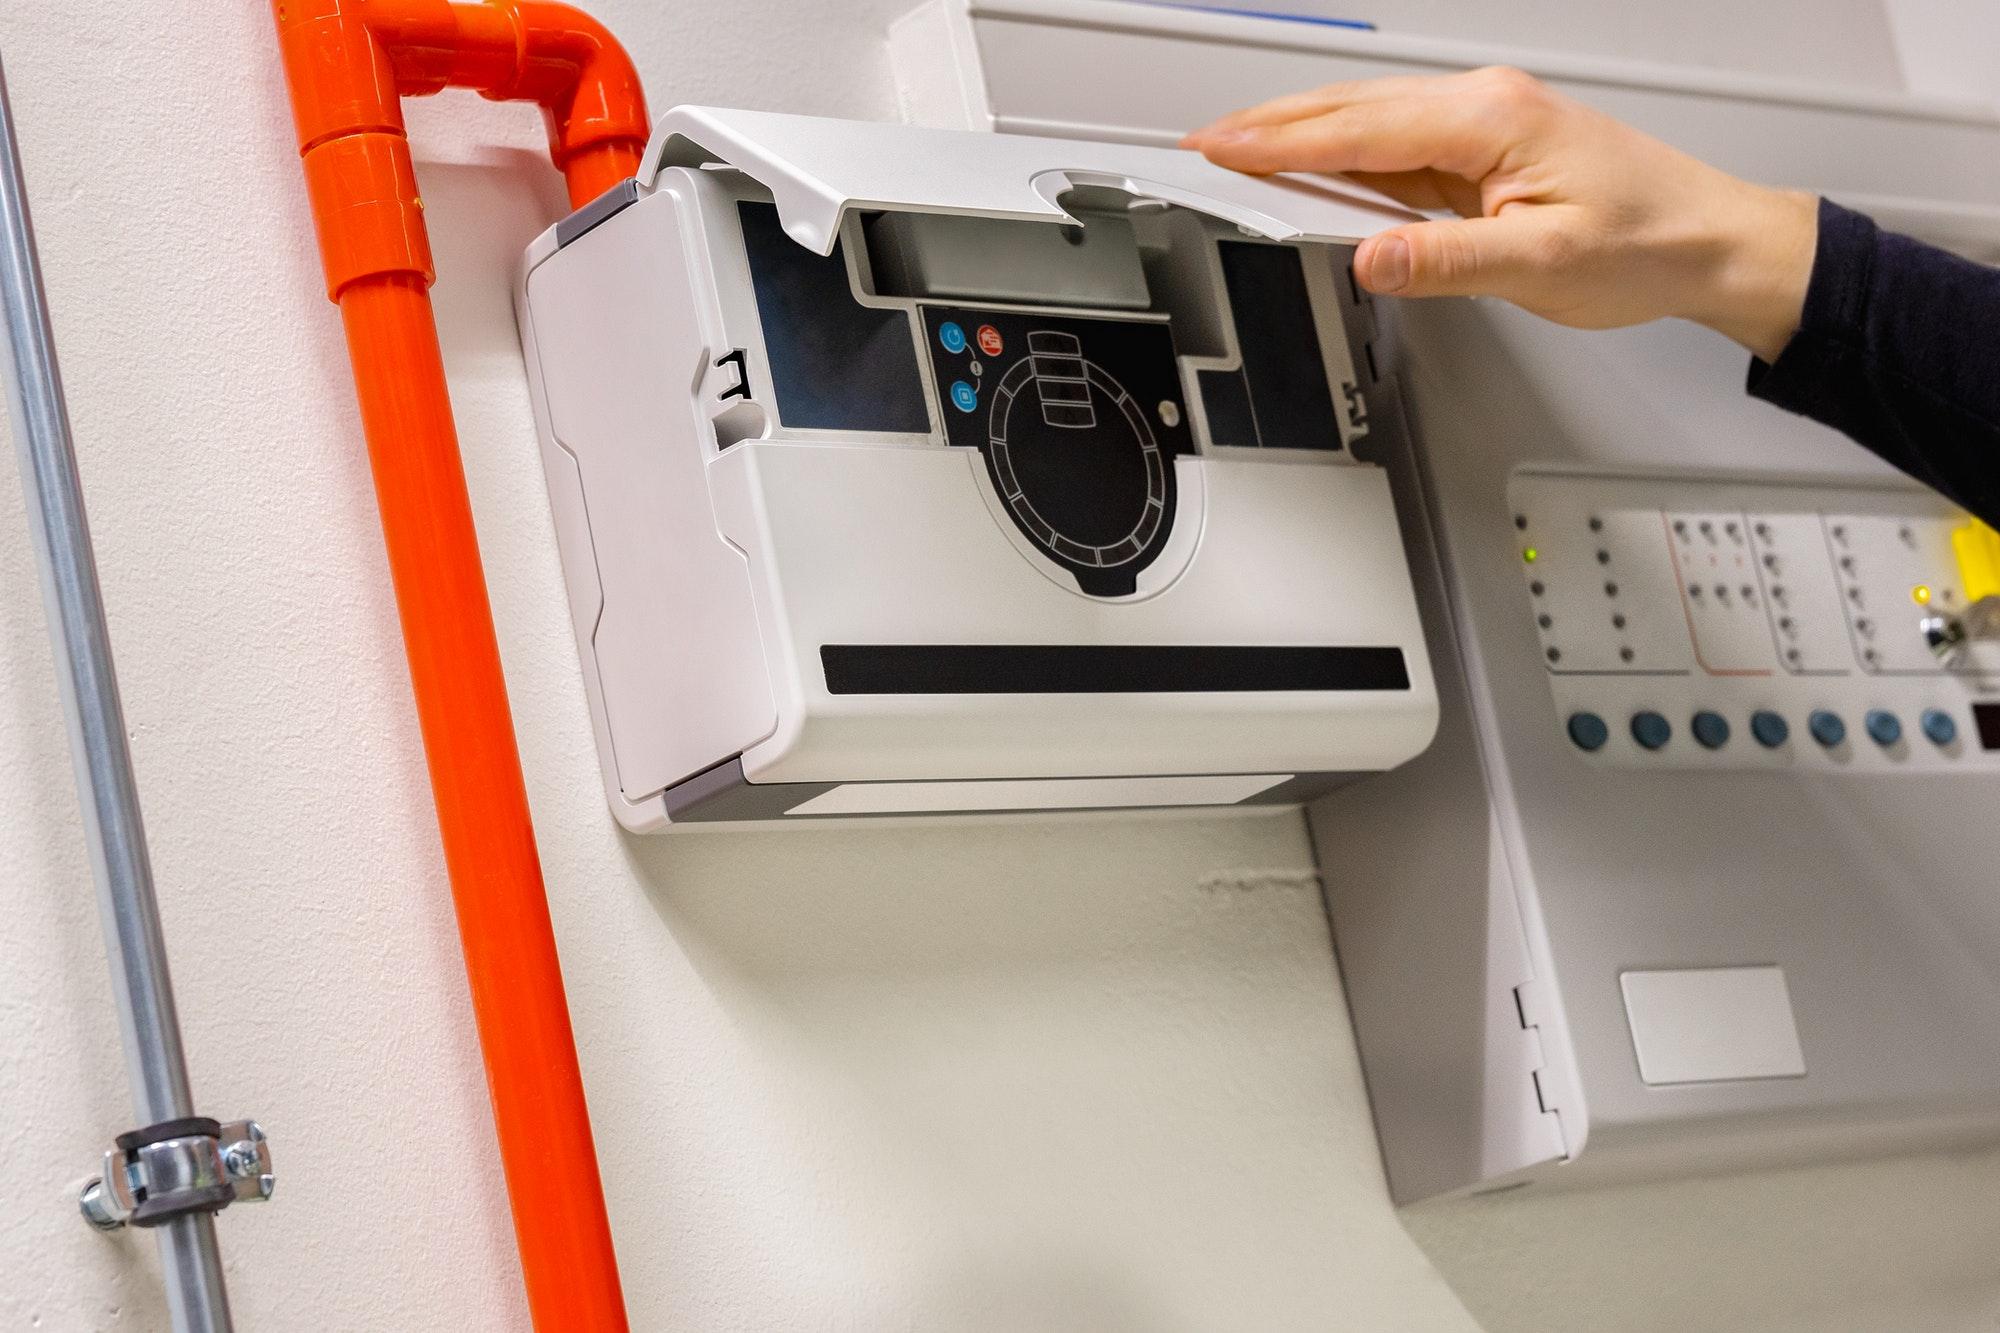 Engineer Checking Smoke Sensor Pannel In Datacenter